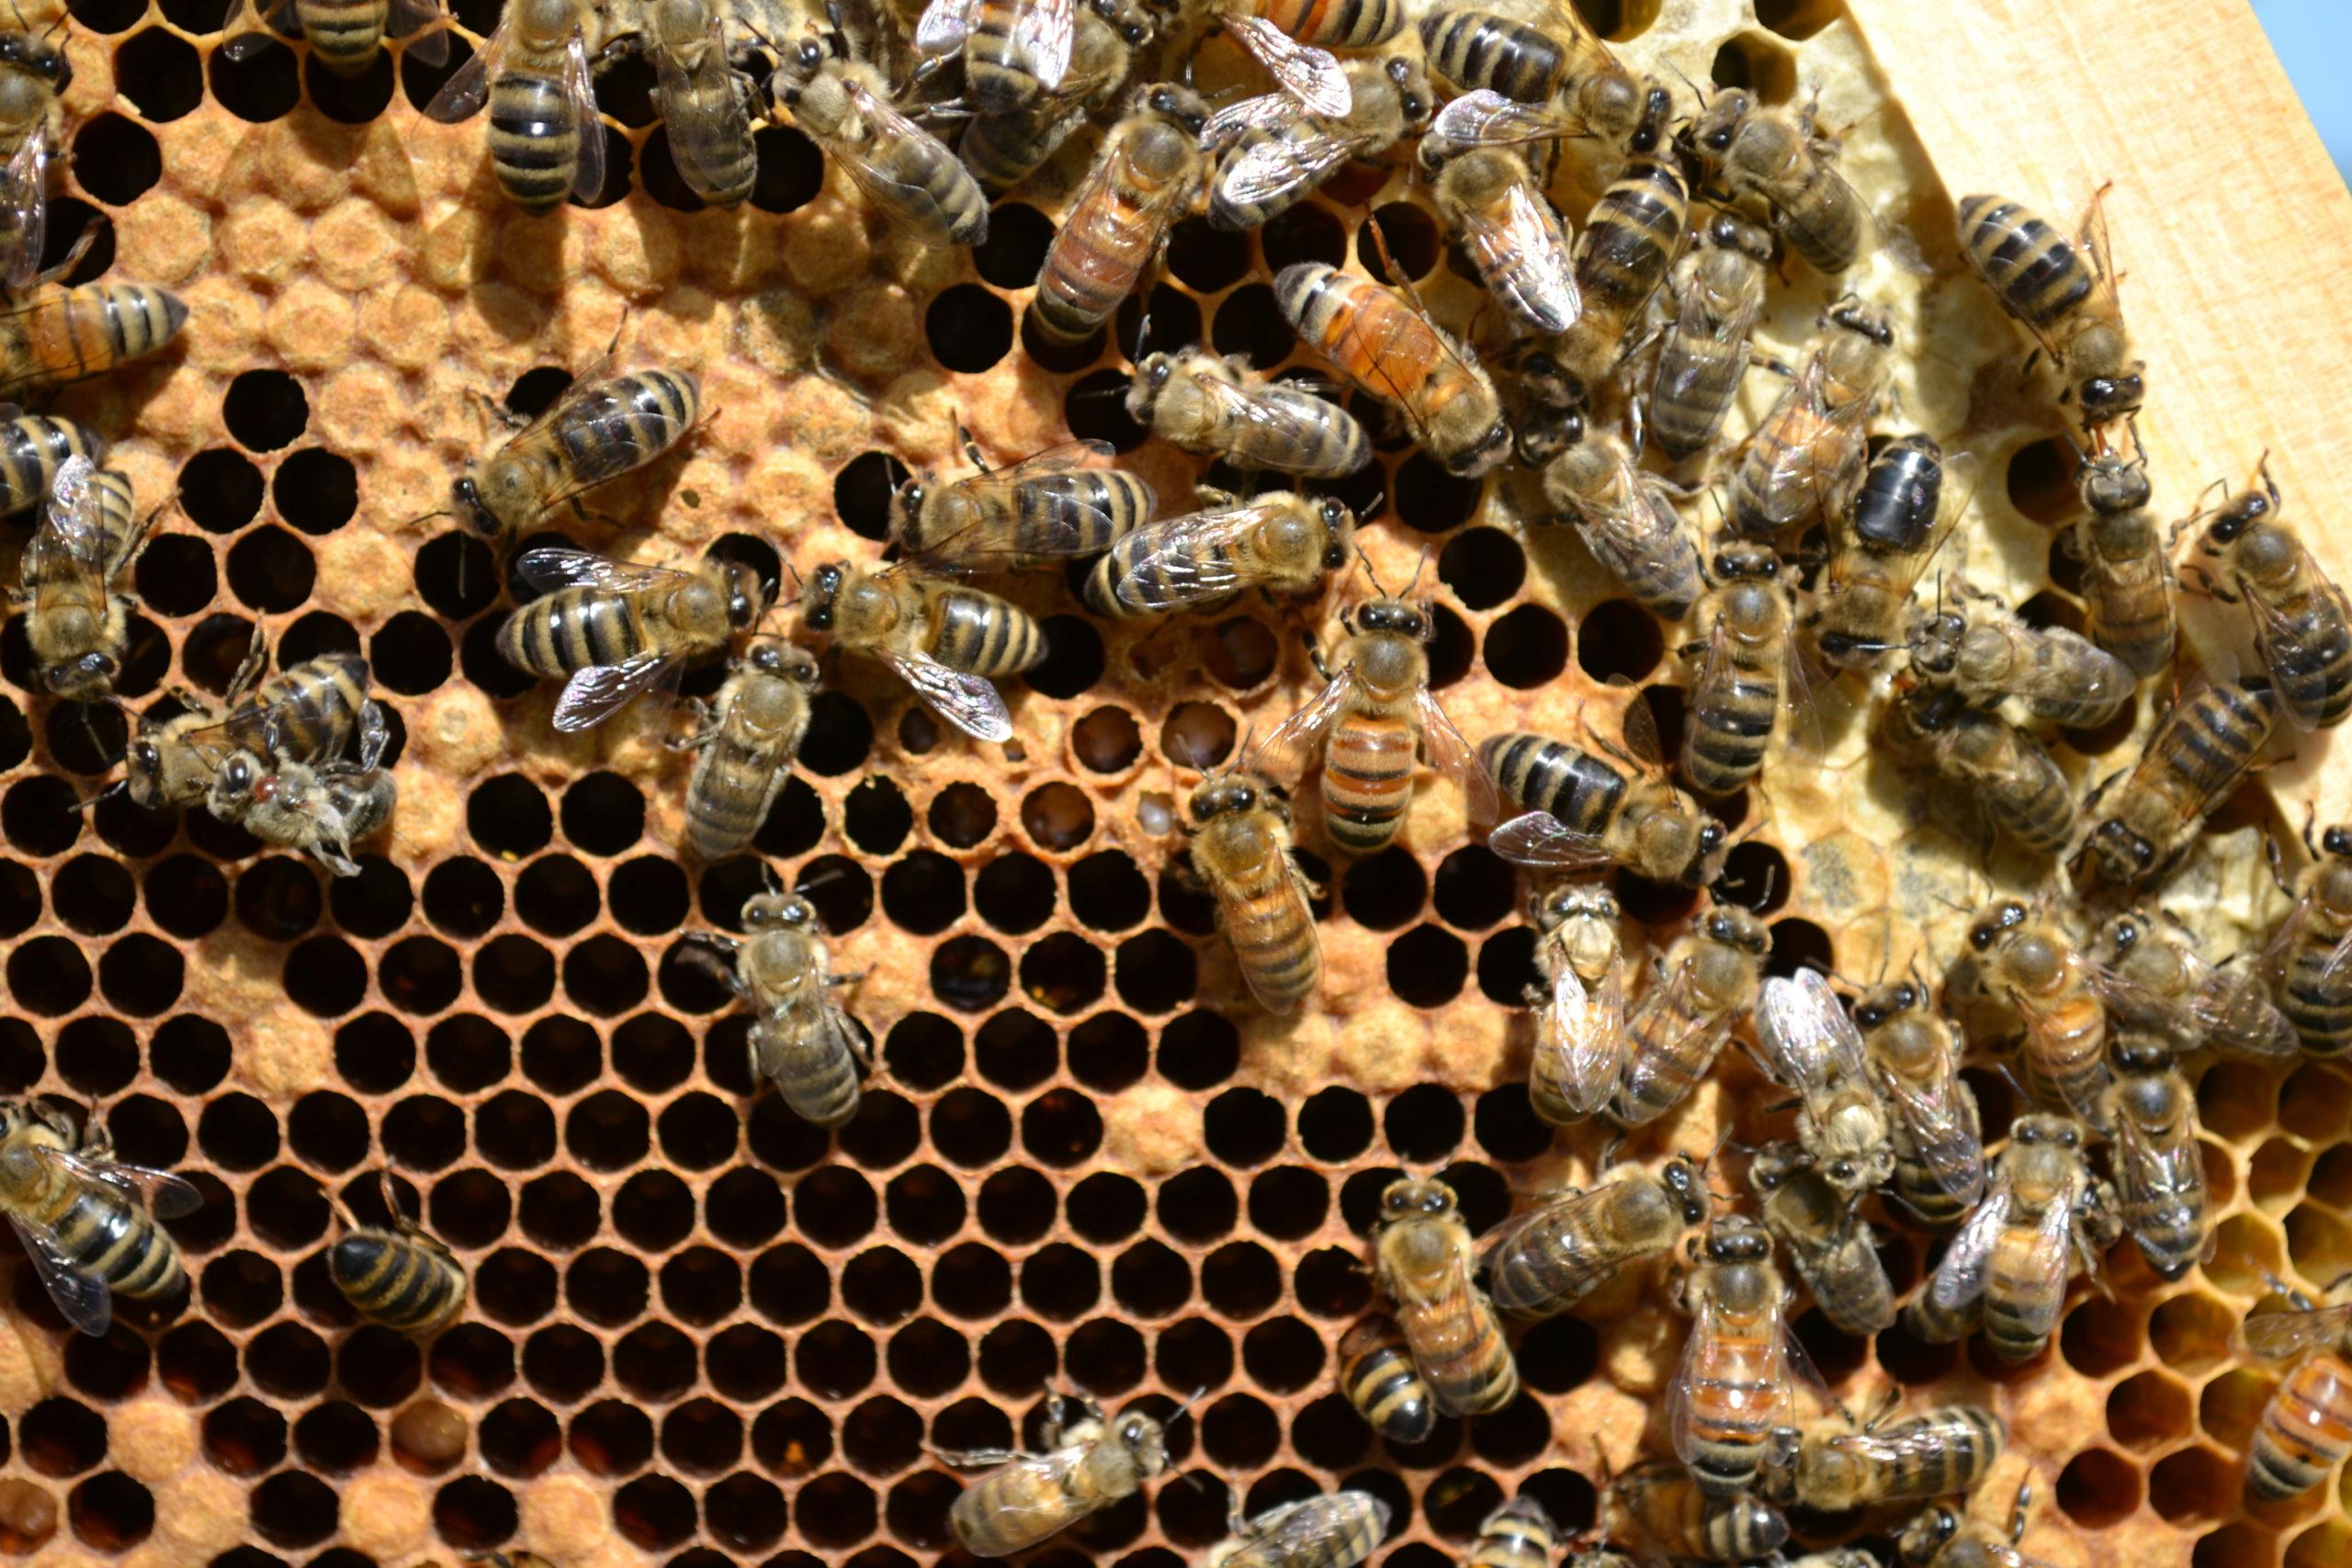 honeybees working a frame